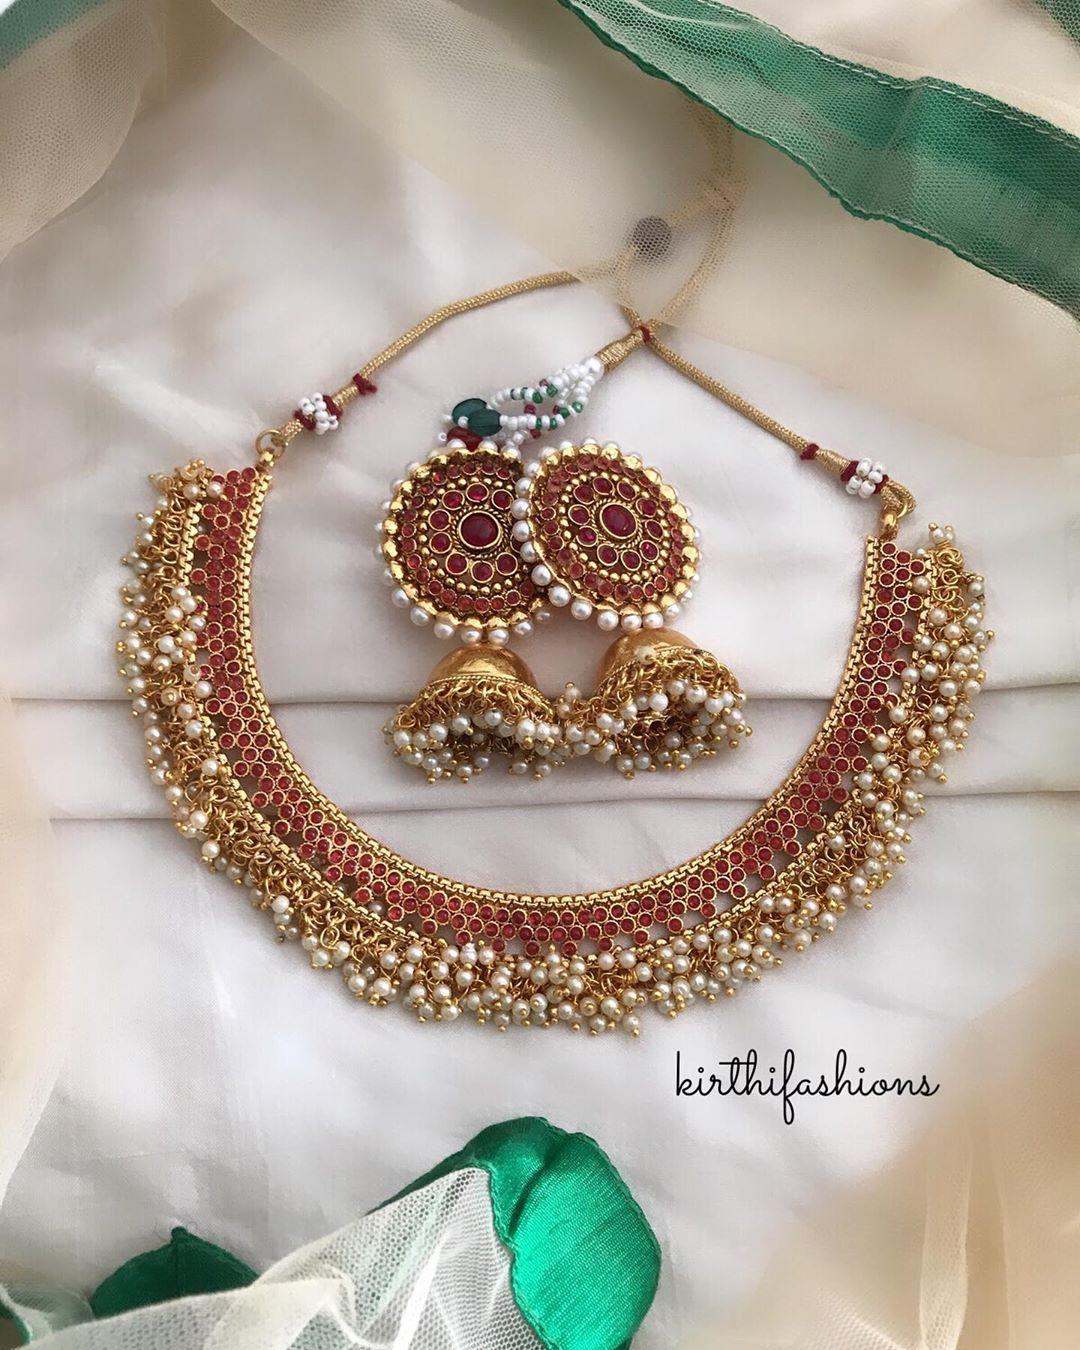 imitation-jewellery-online-shopping-17